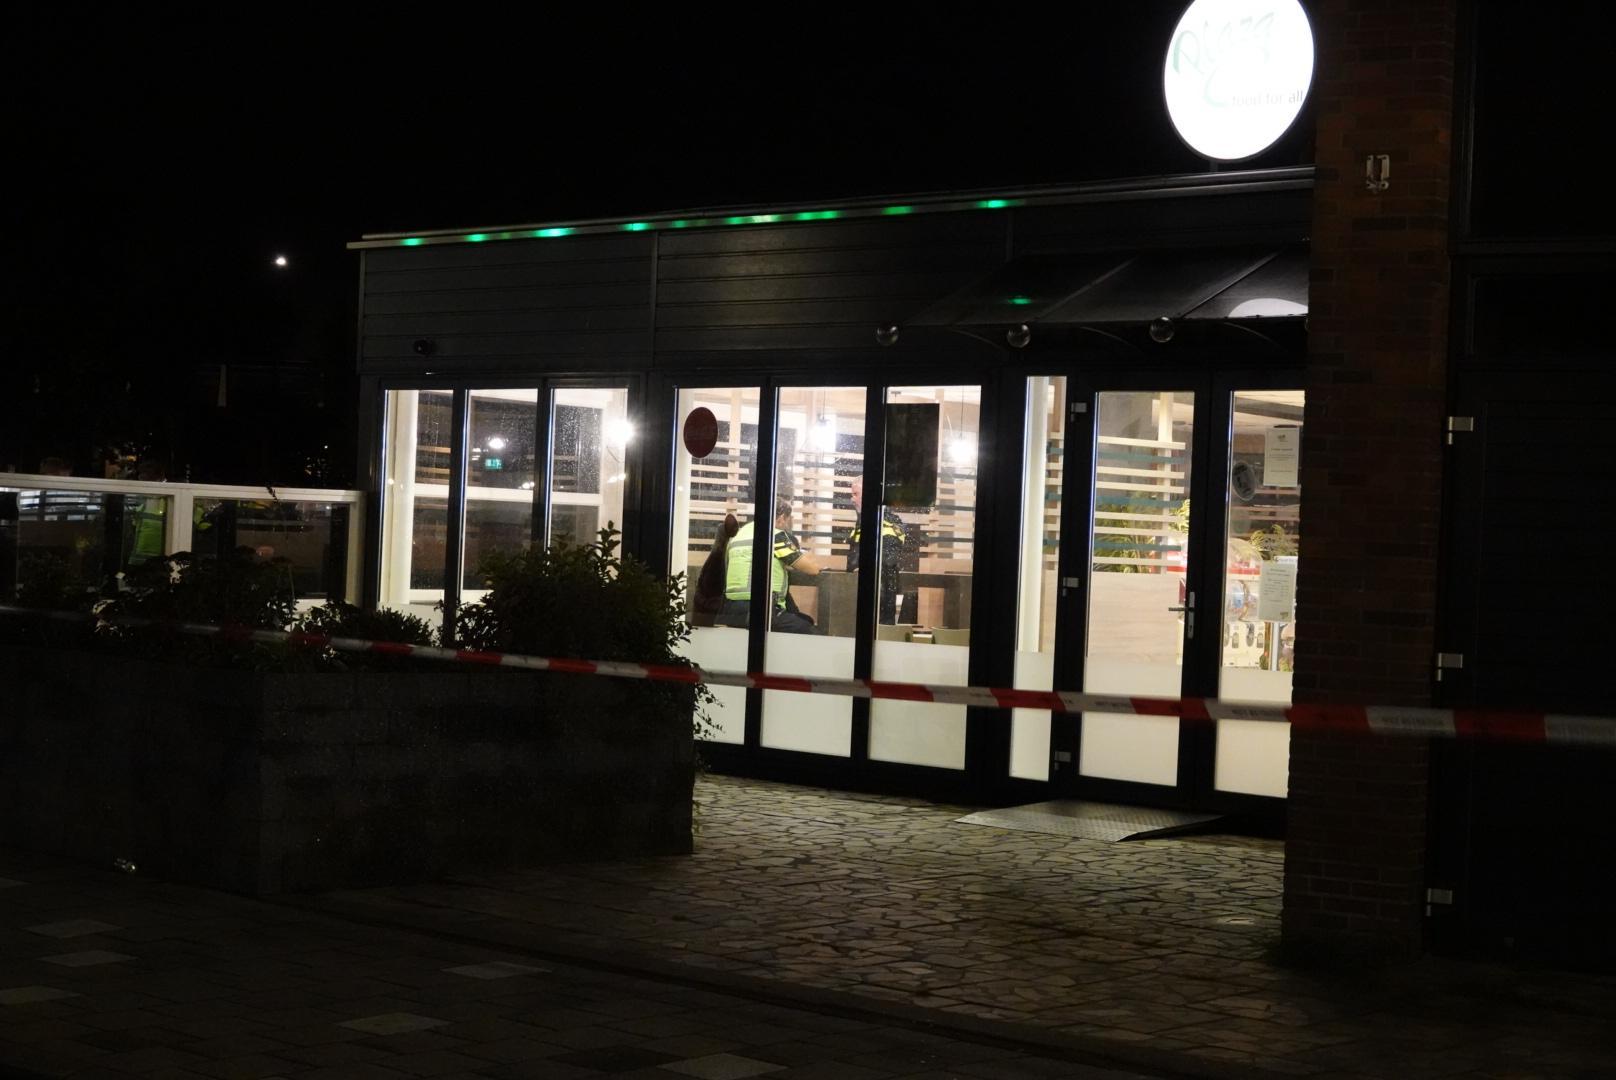 Gewapende overval op snackbar in Heerhugowaard